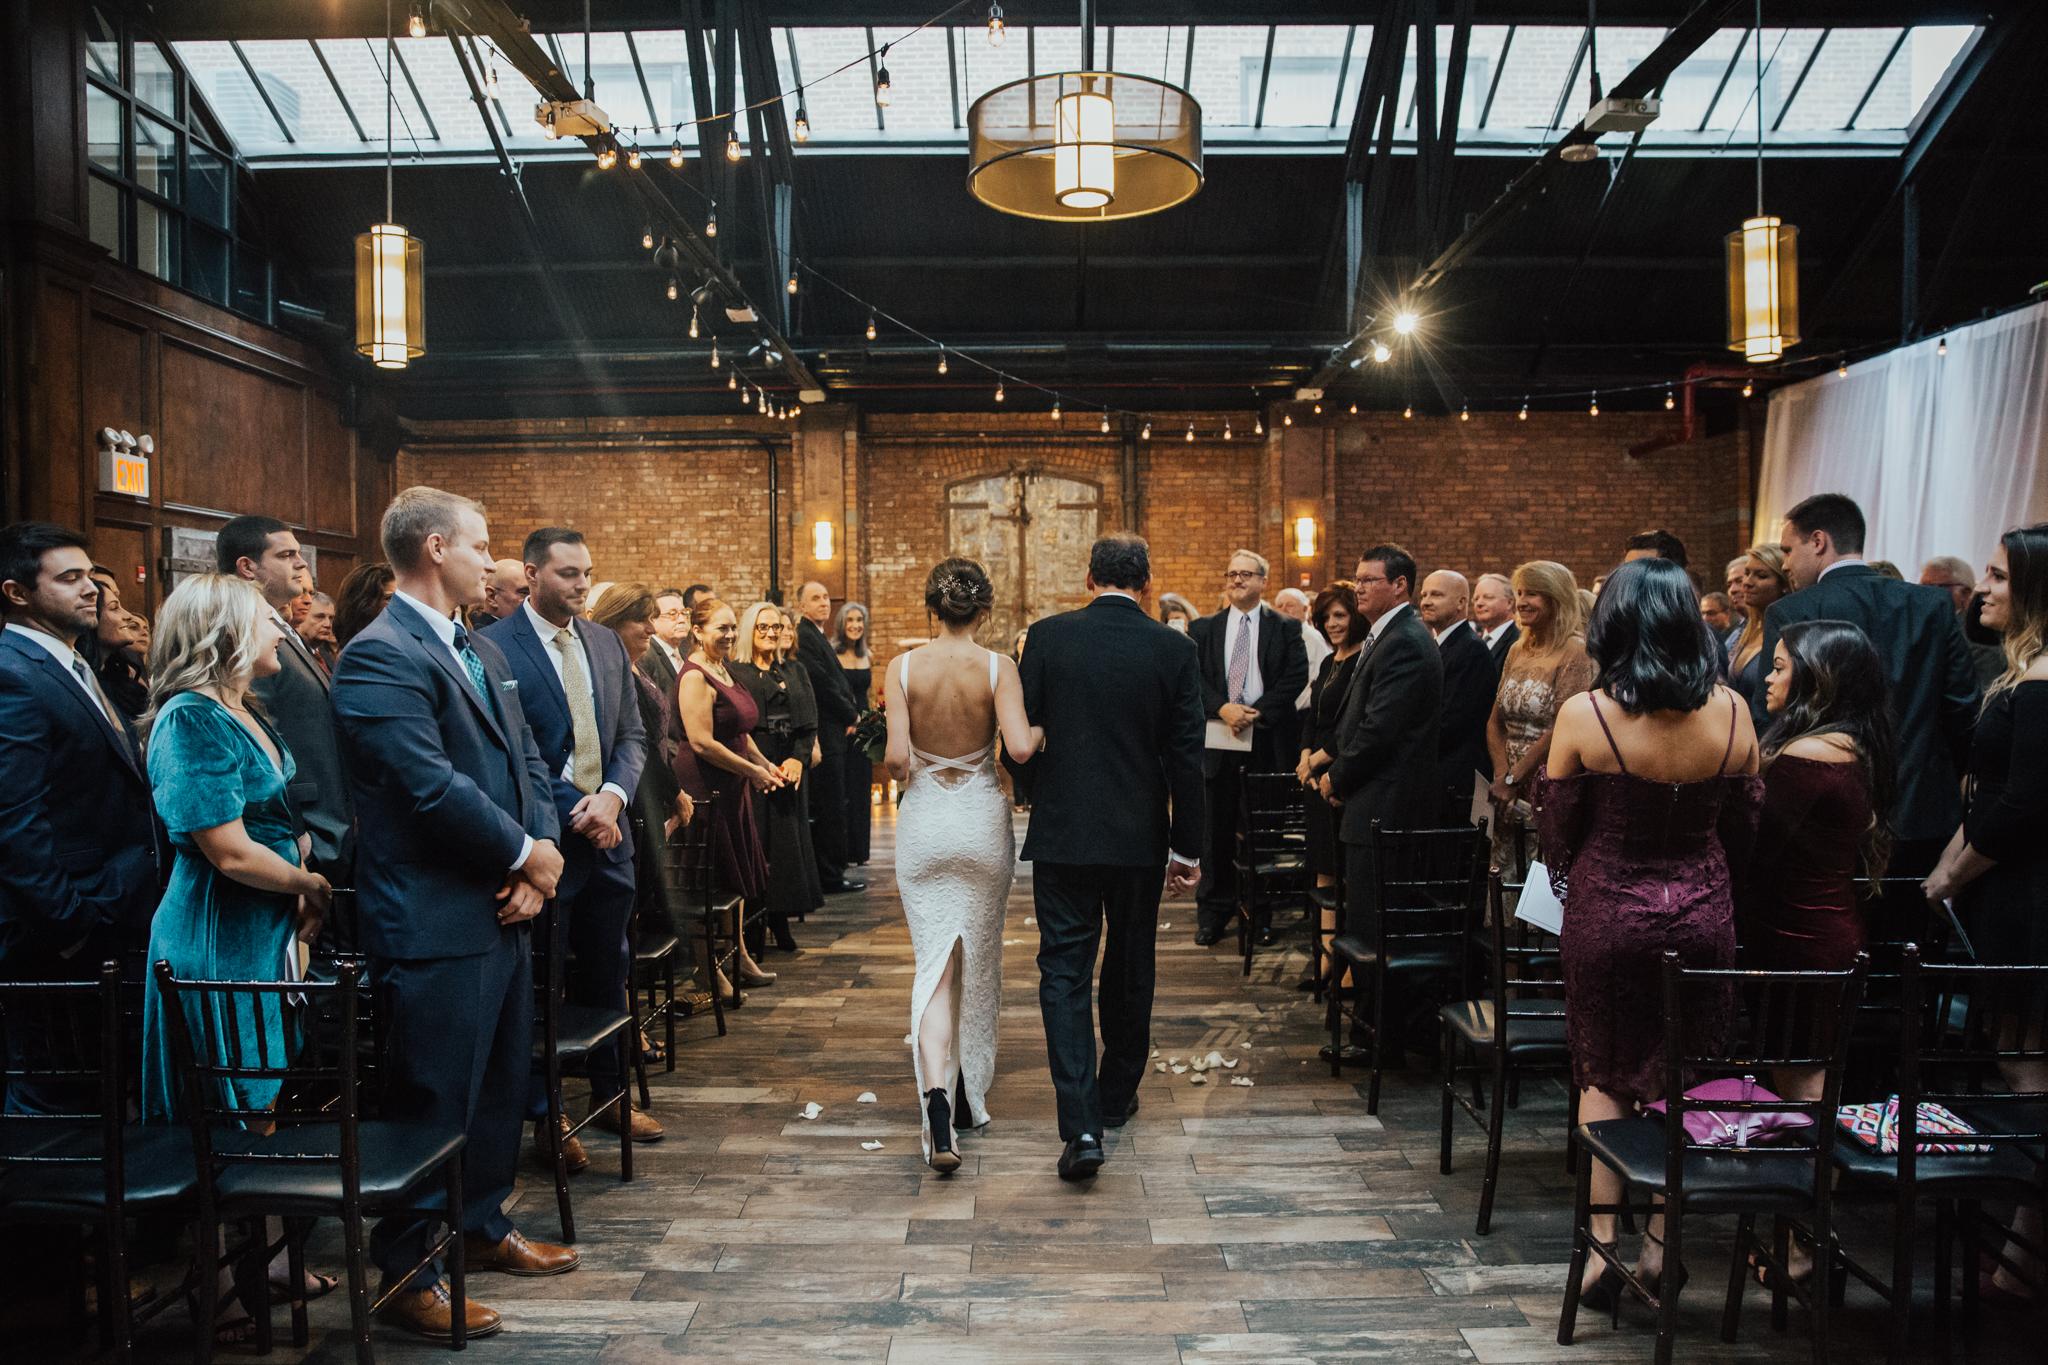 26-bridge-wedding-brooklyn-041.JPG